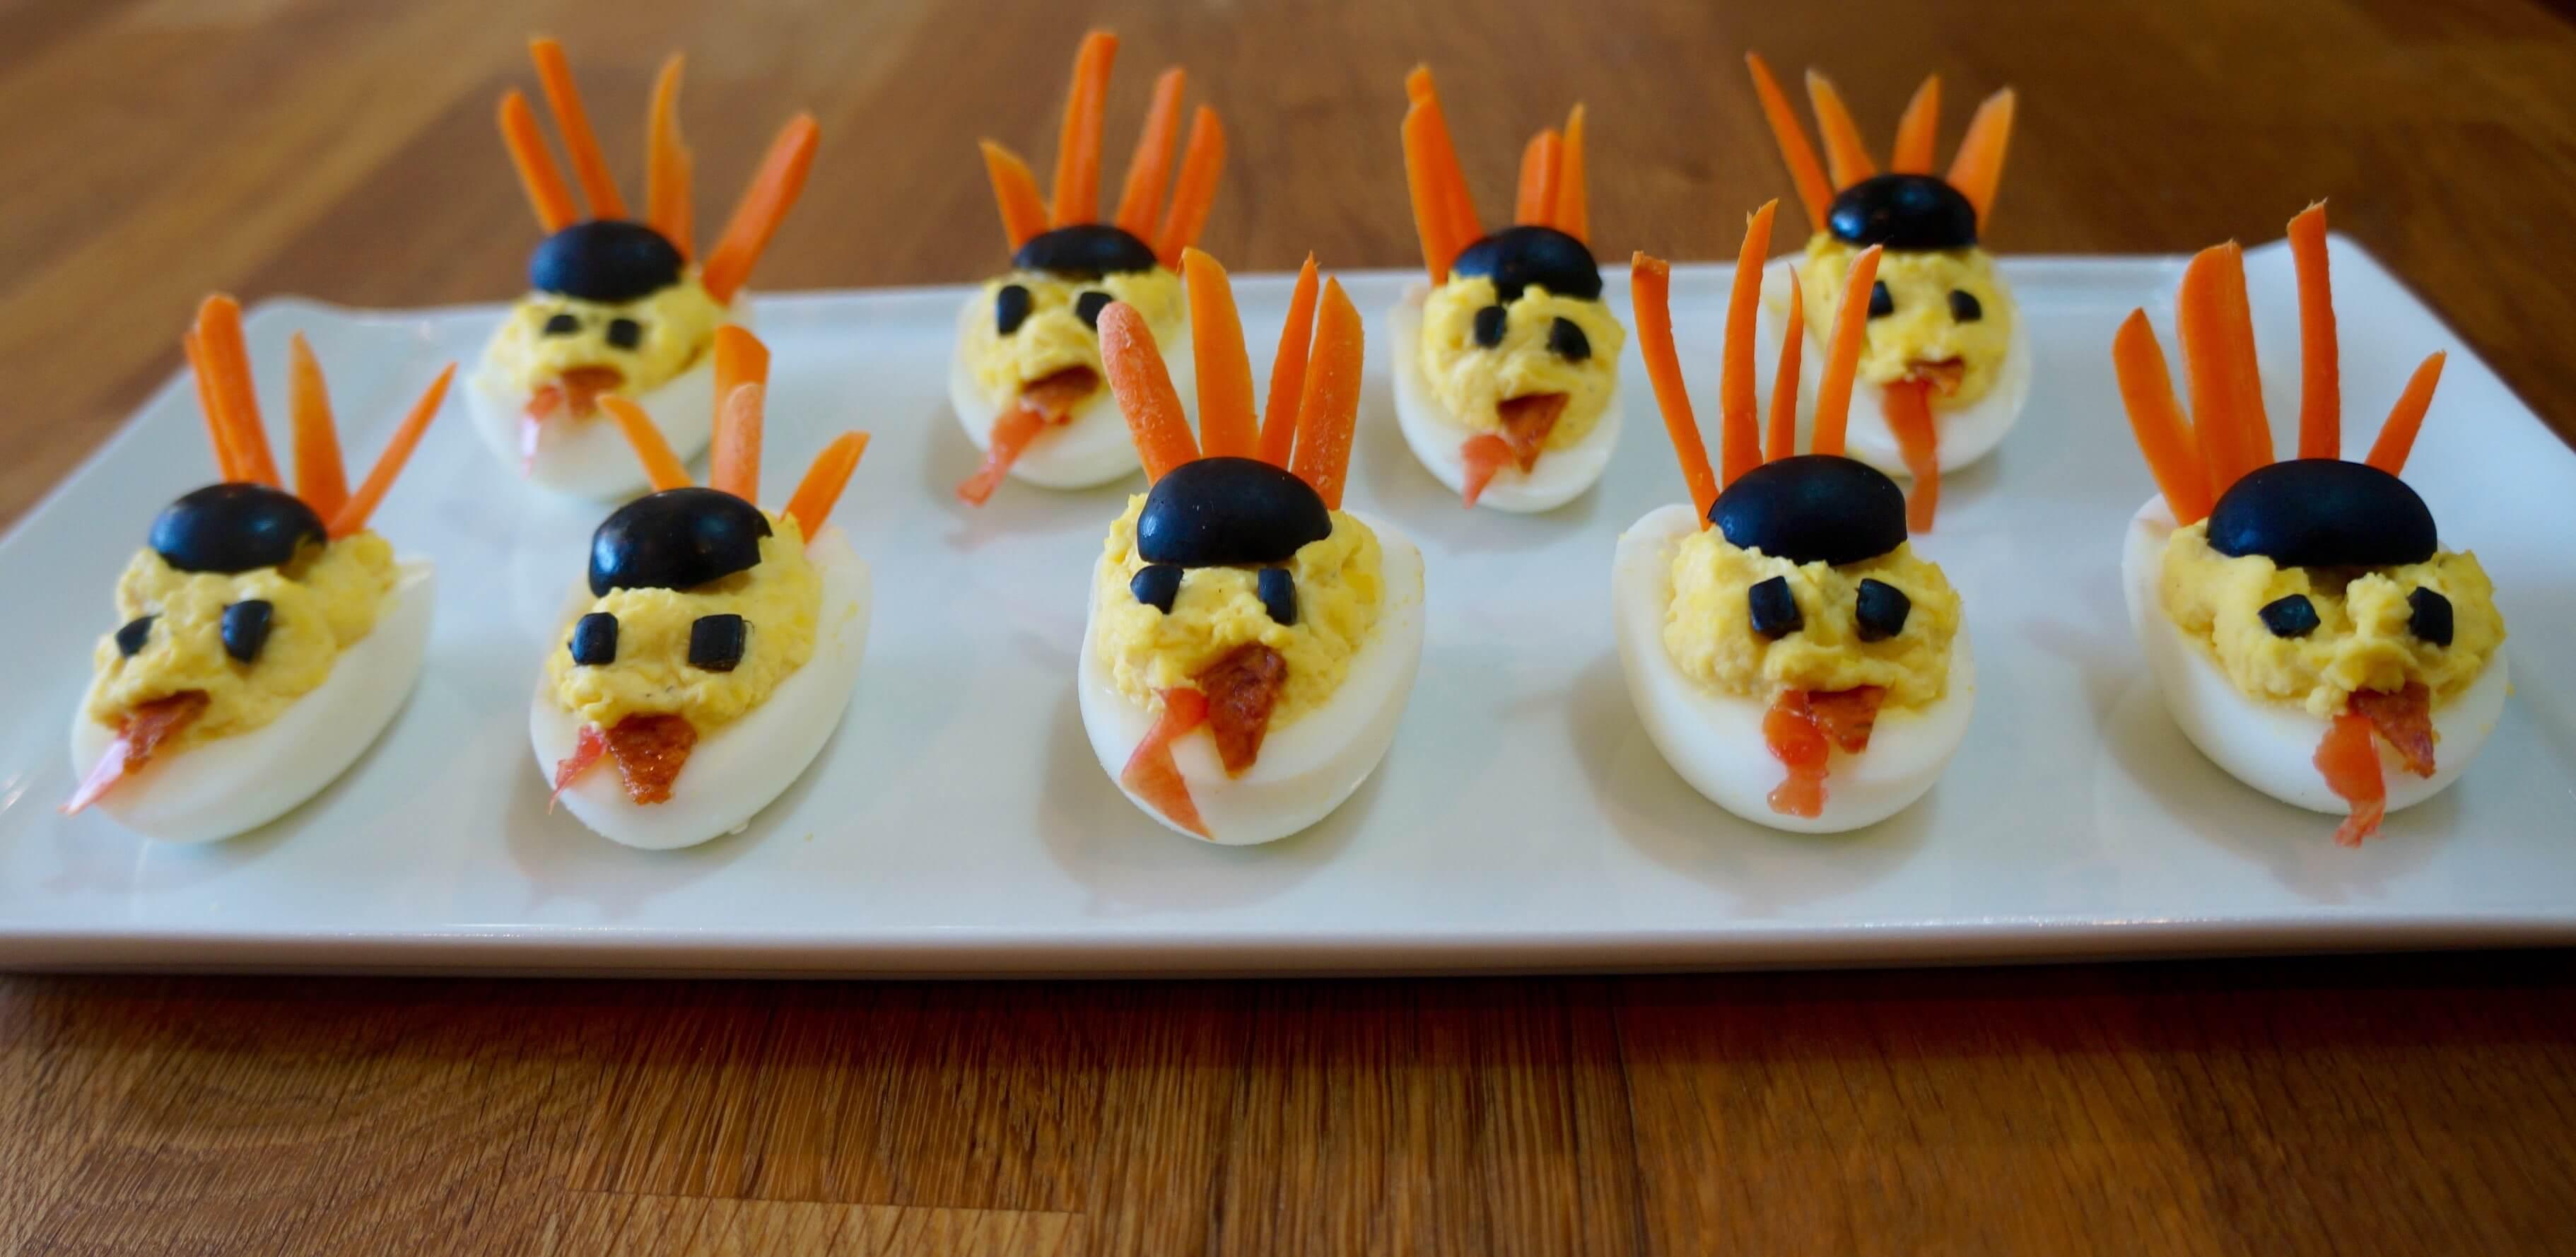 Tiny turkey edible army!